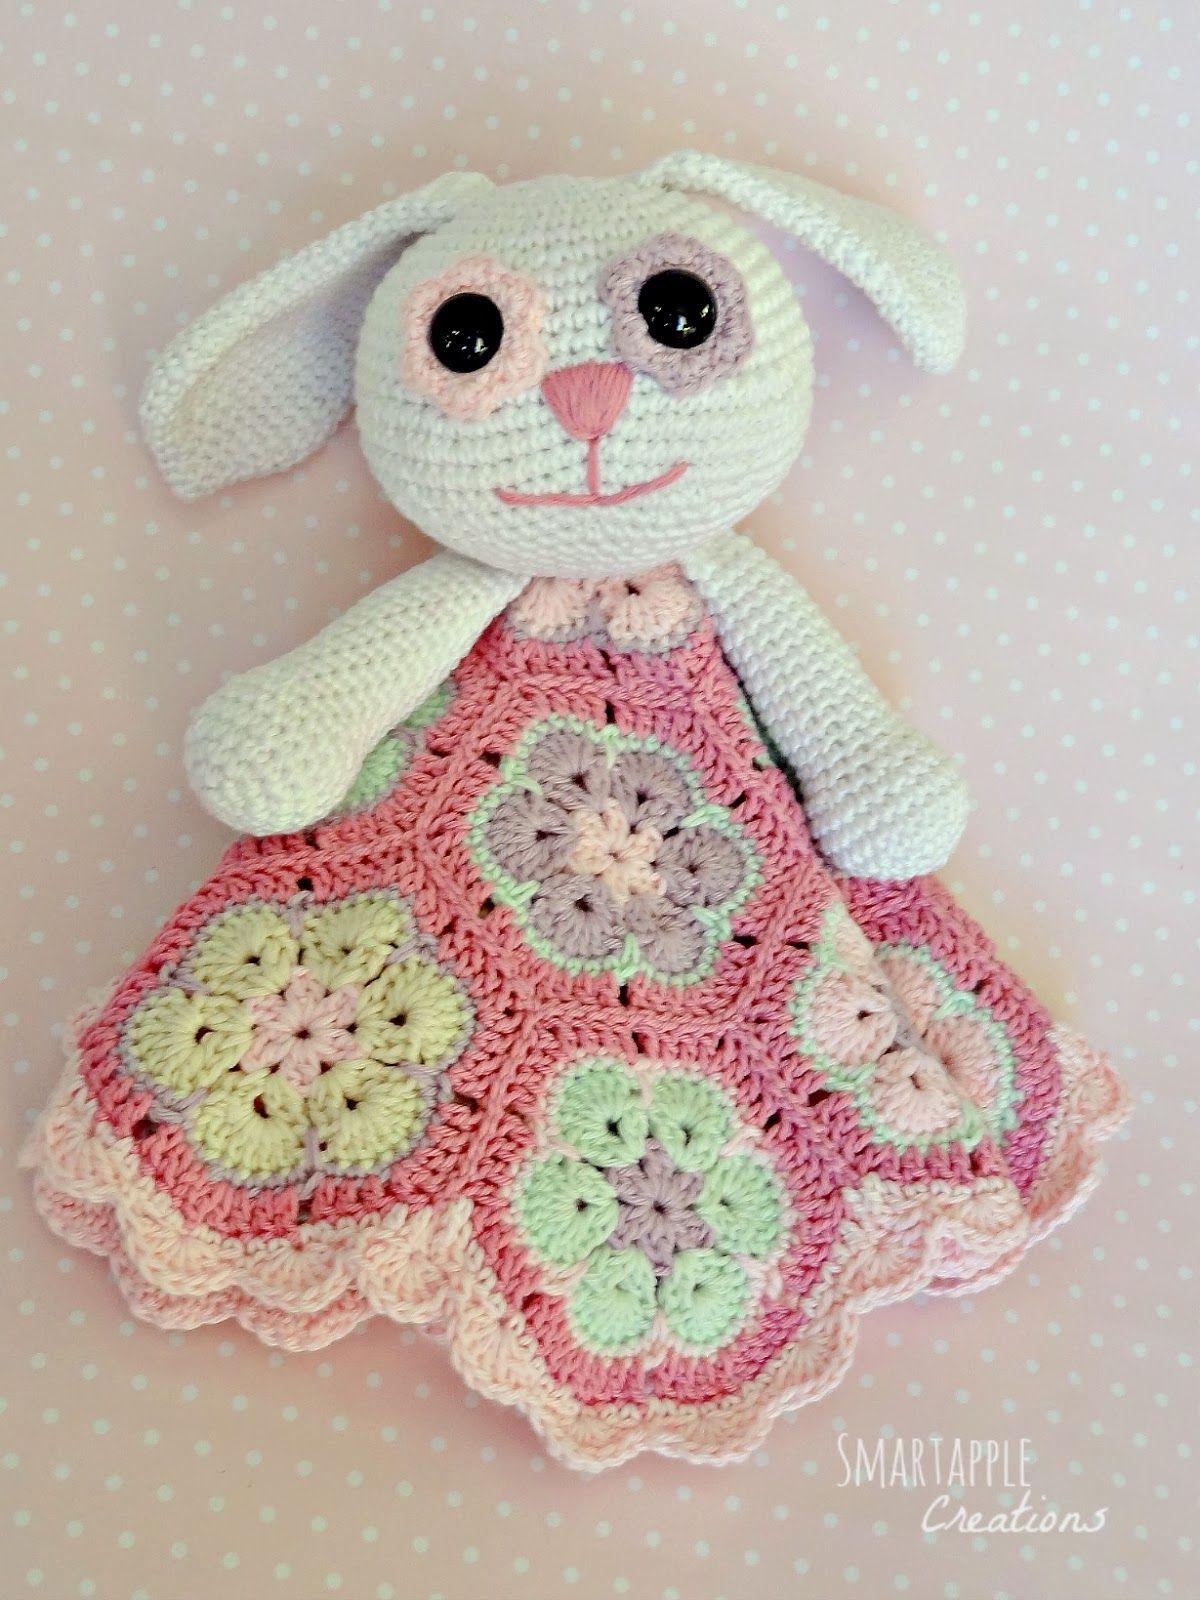 Smartapple Amigurumi and Crochet Creations: Crochet bunny lovey ...